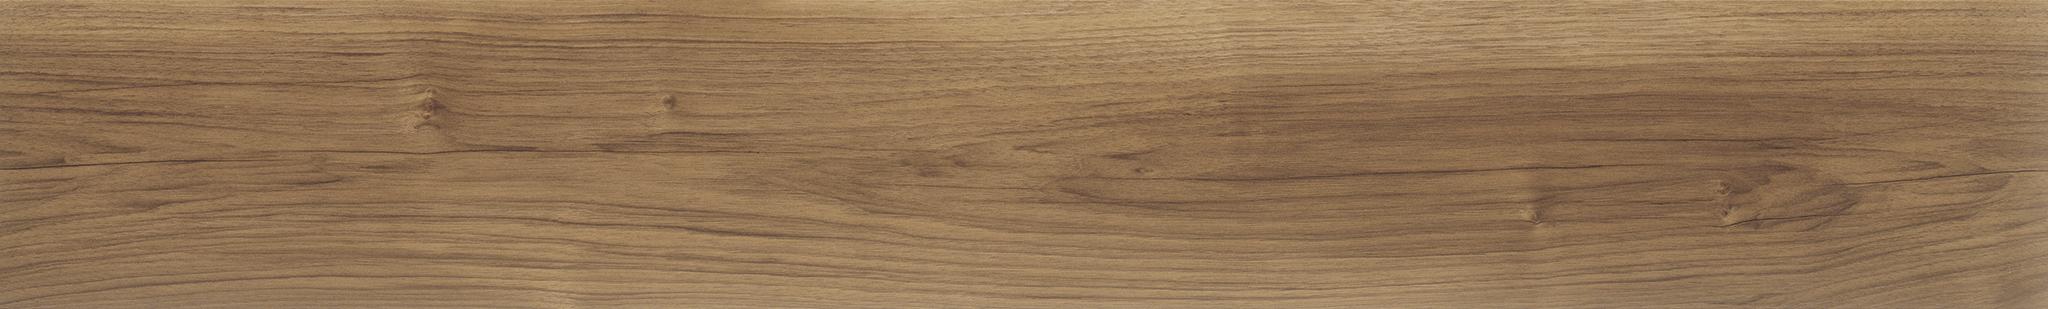 eterna Loc 7 Oak select 3-strip